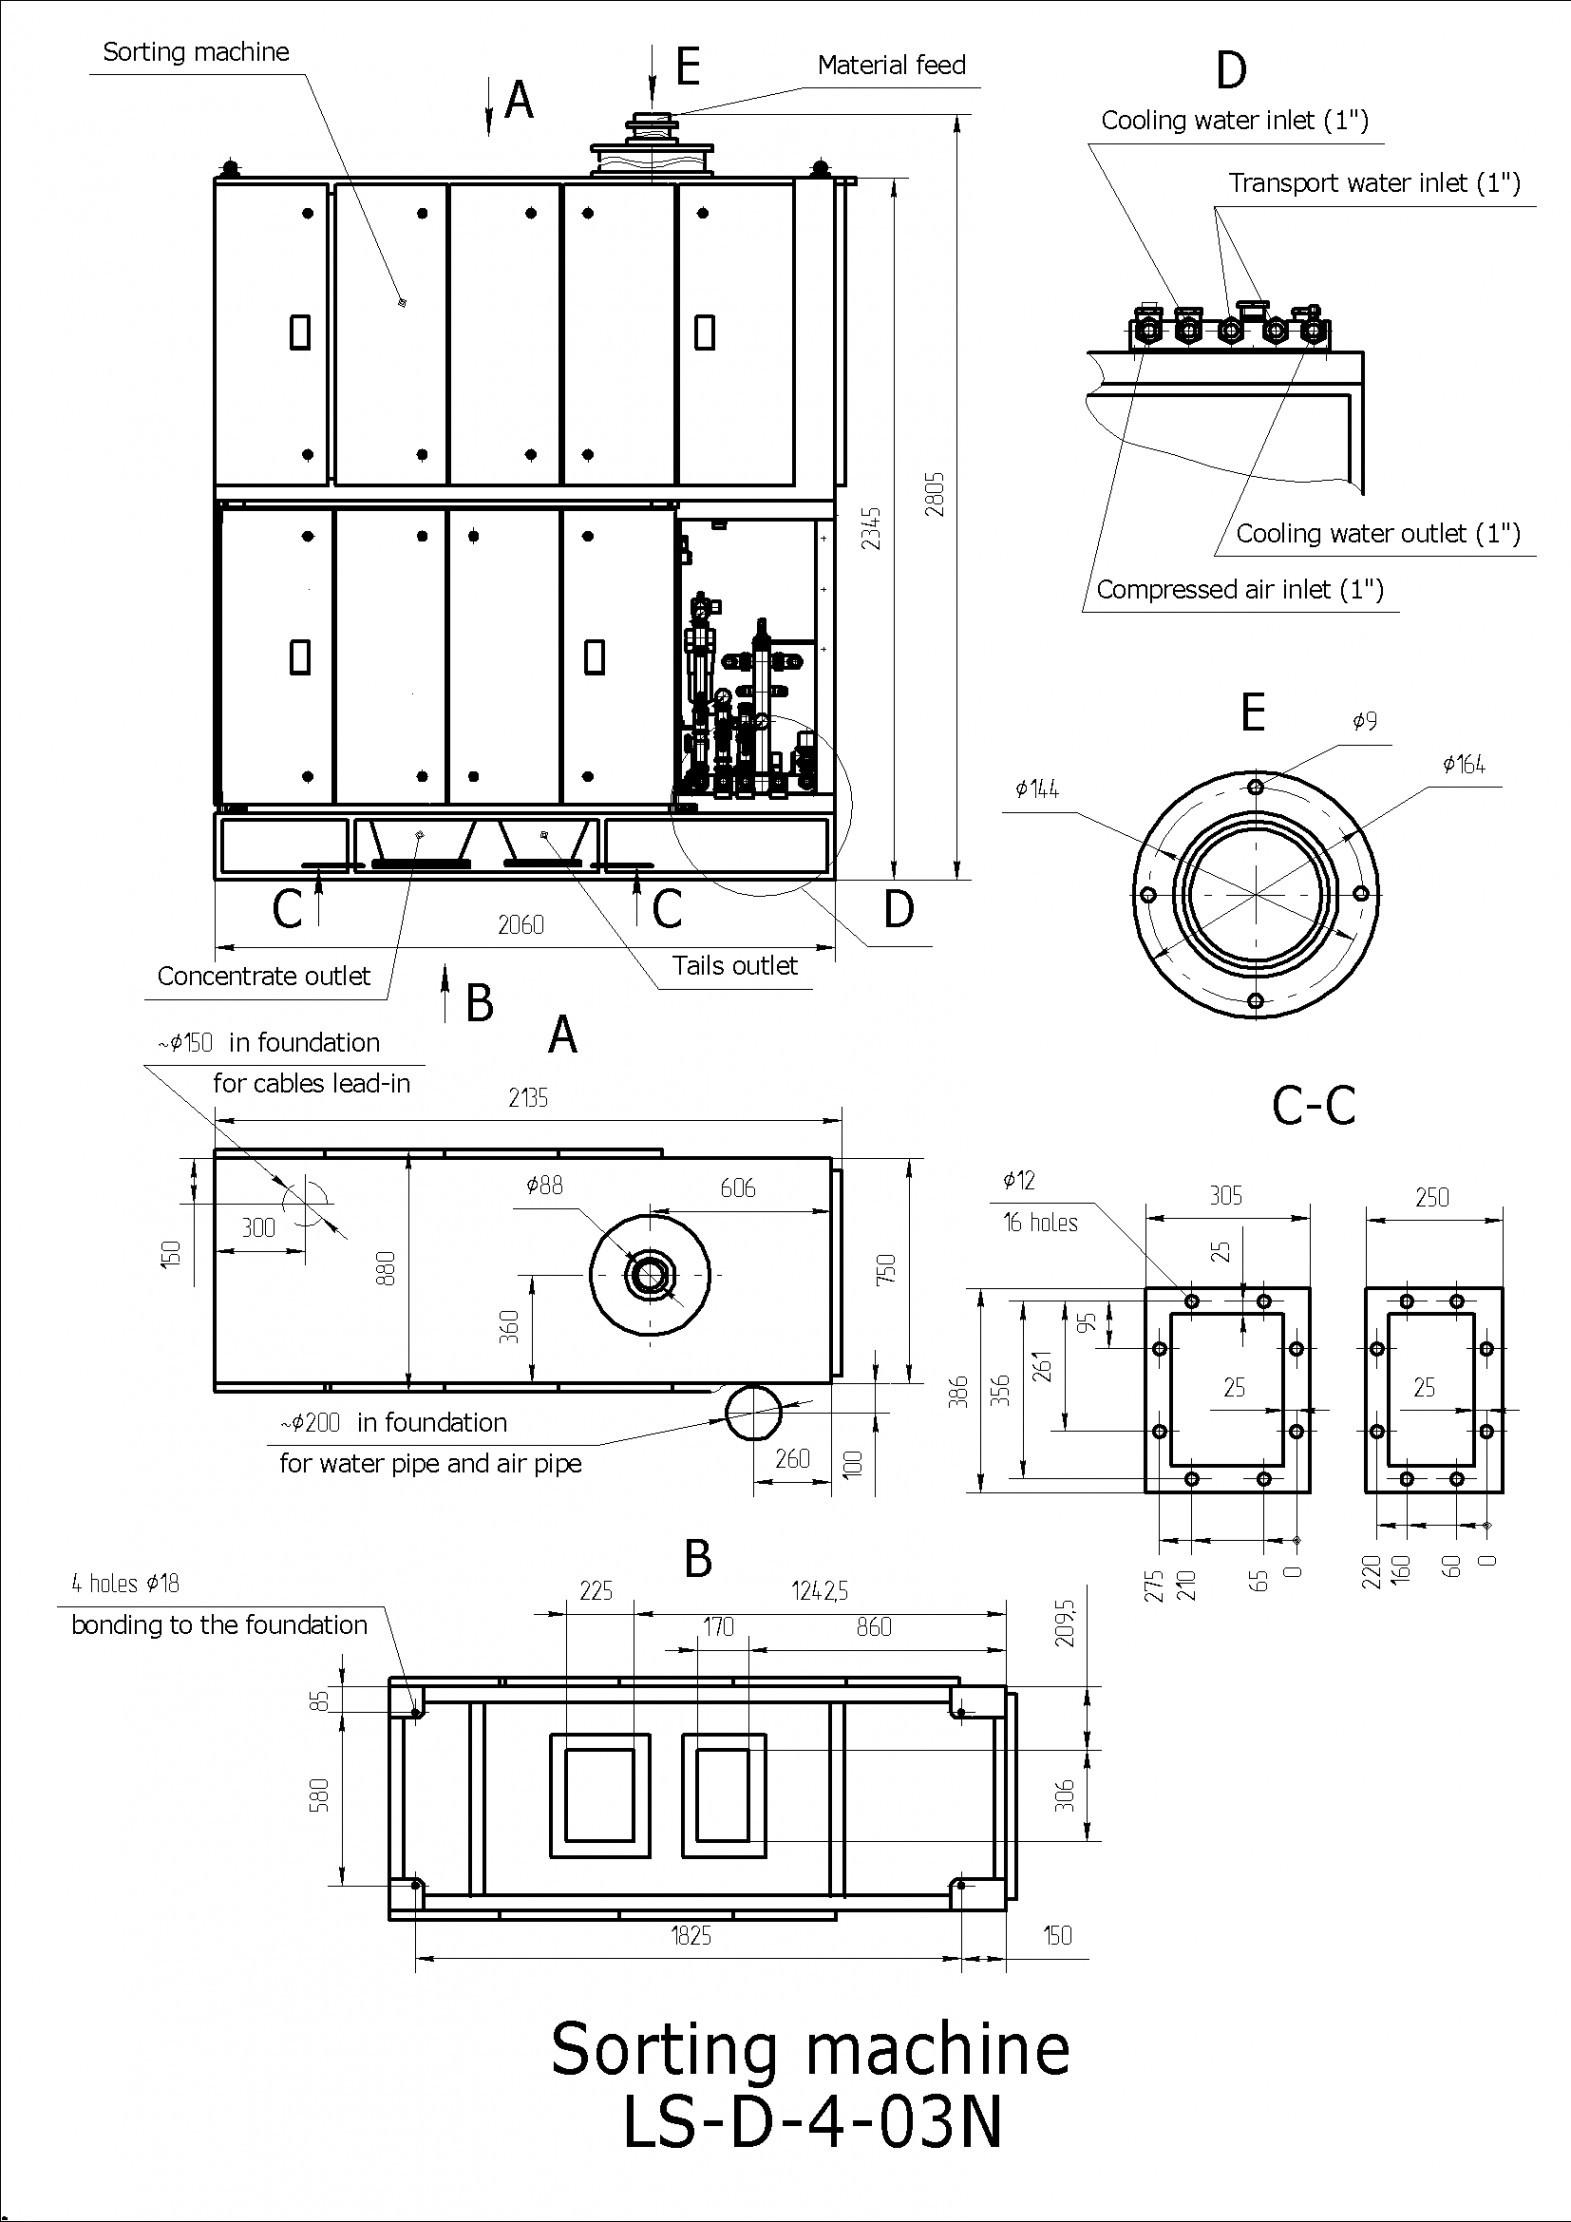 X Ray Tube Diagram – Sortech Ls D4 03n X Ray Sorter